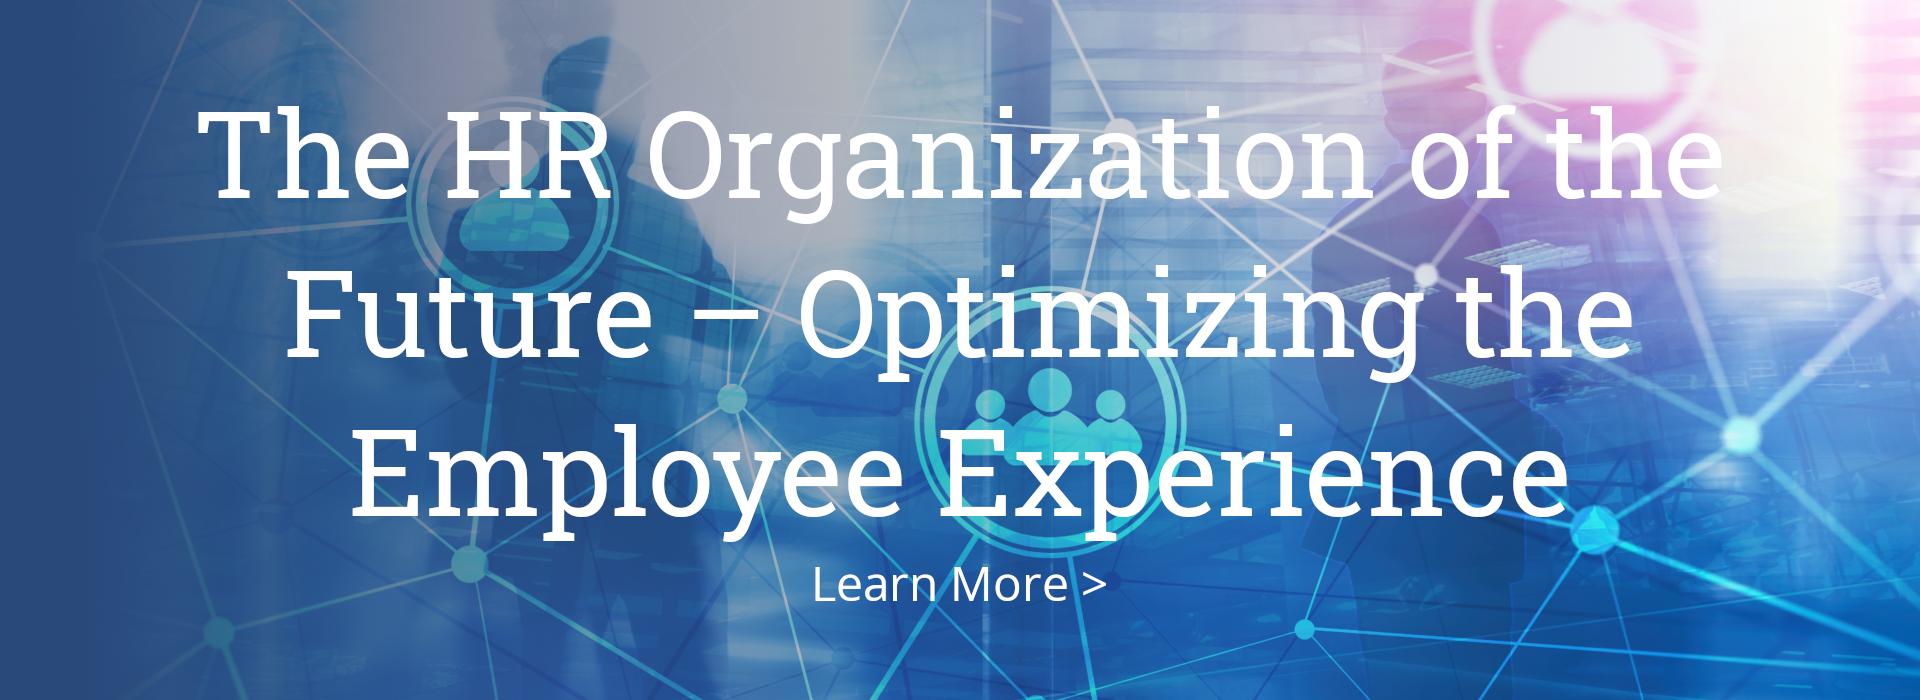 HR-Organization-Future-home-carousel